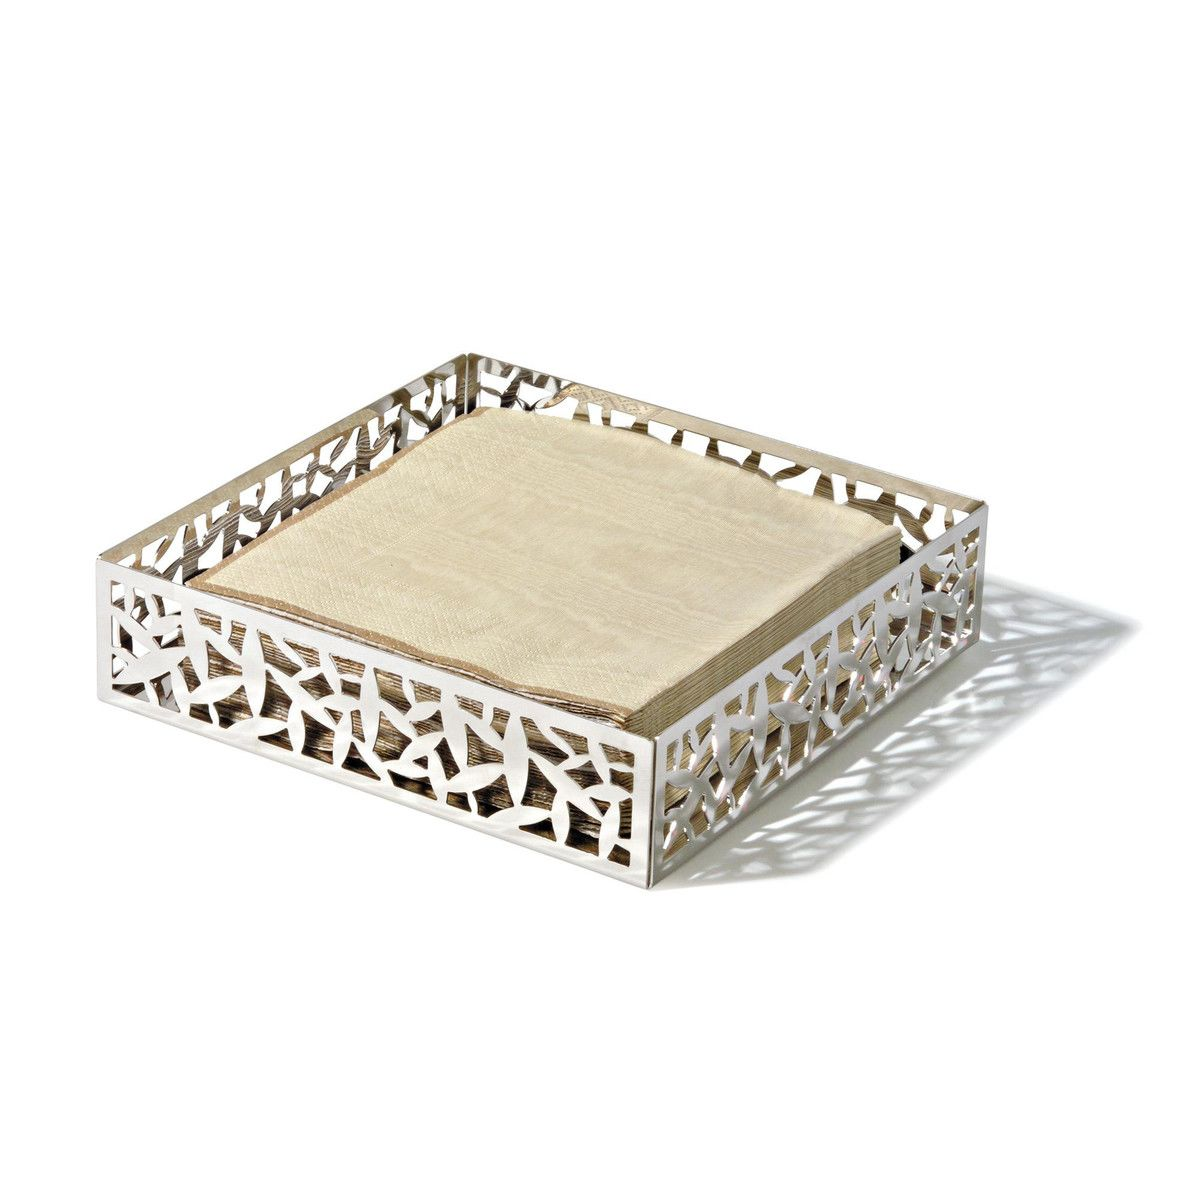 Cactus porte serviettes de table alessi serviettes - Porte serviette de table ...